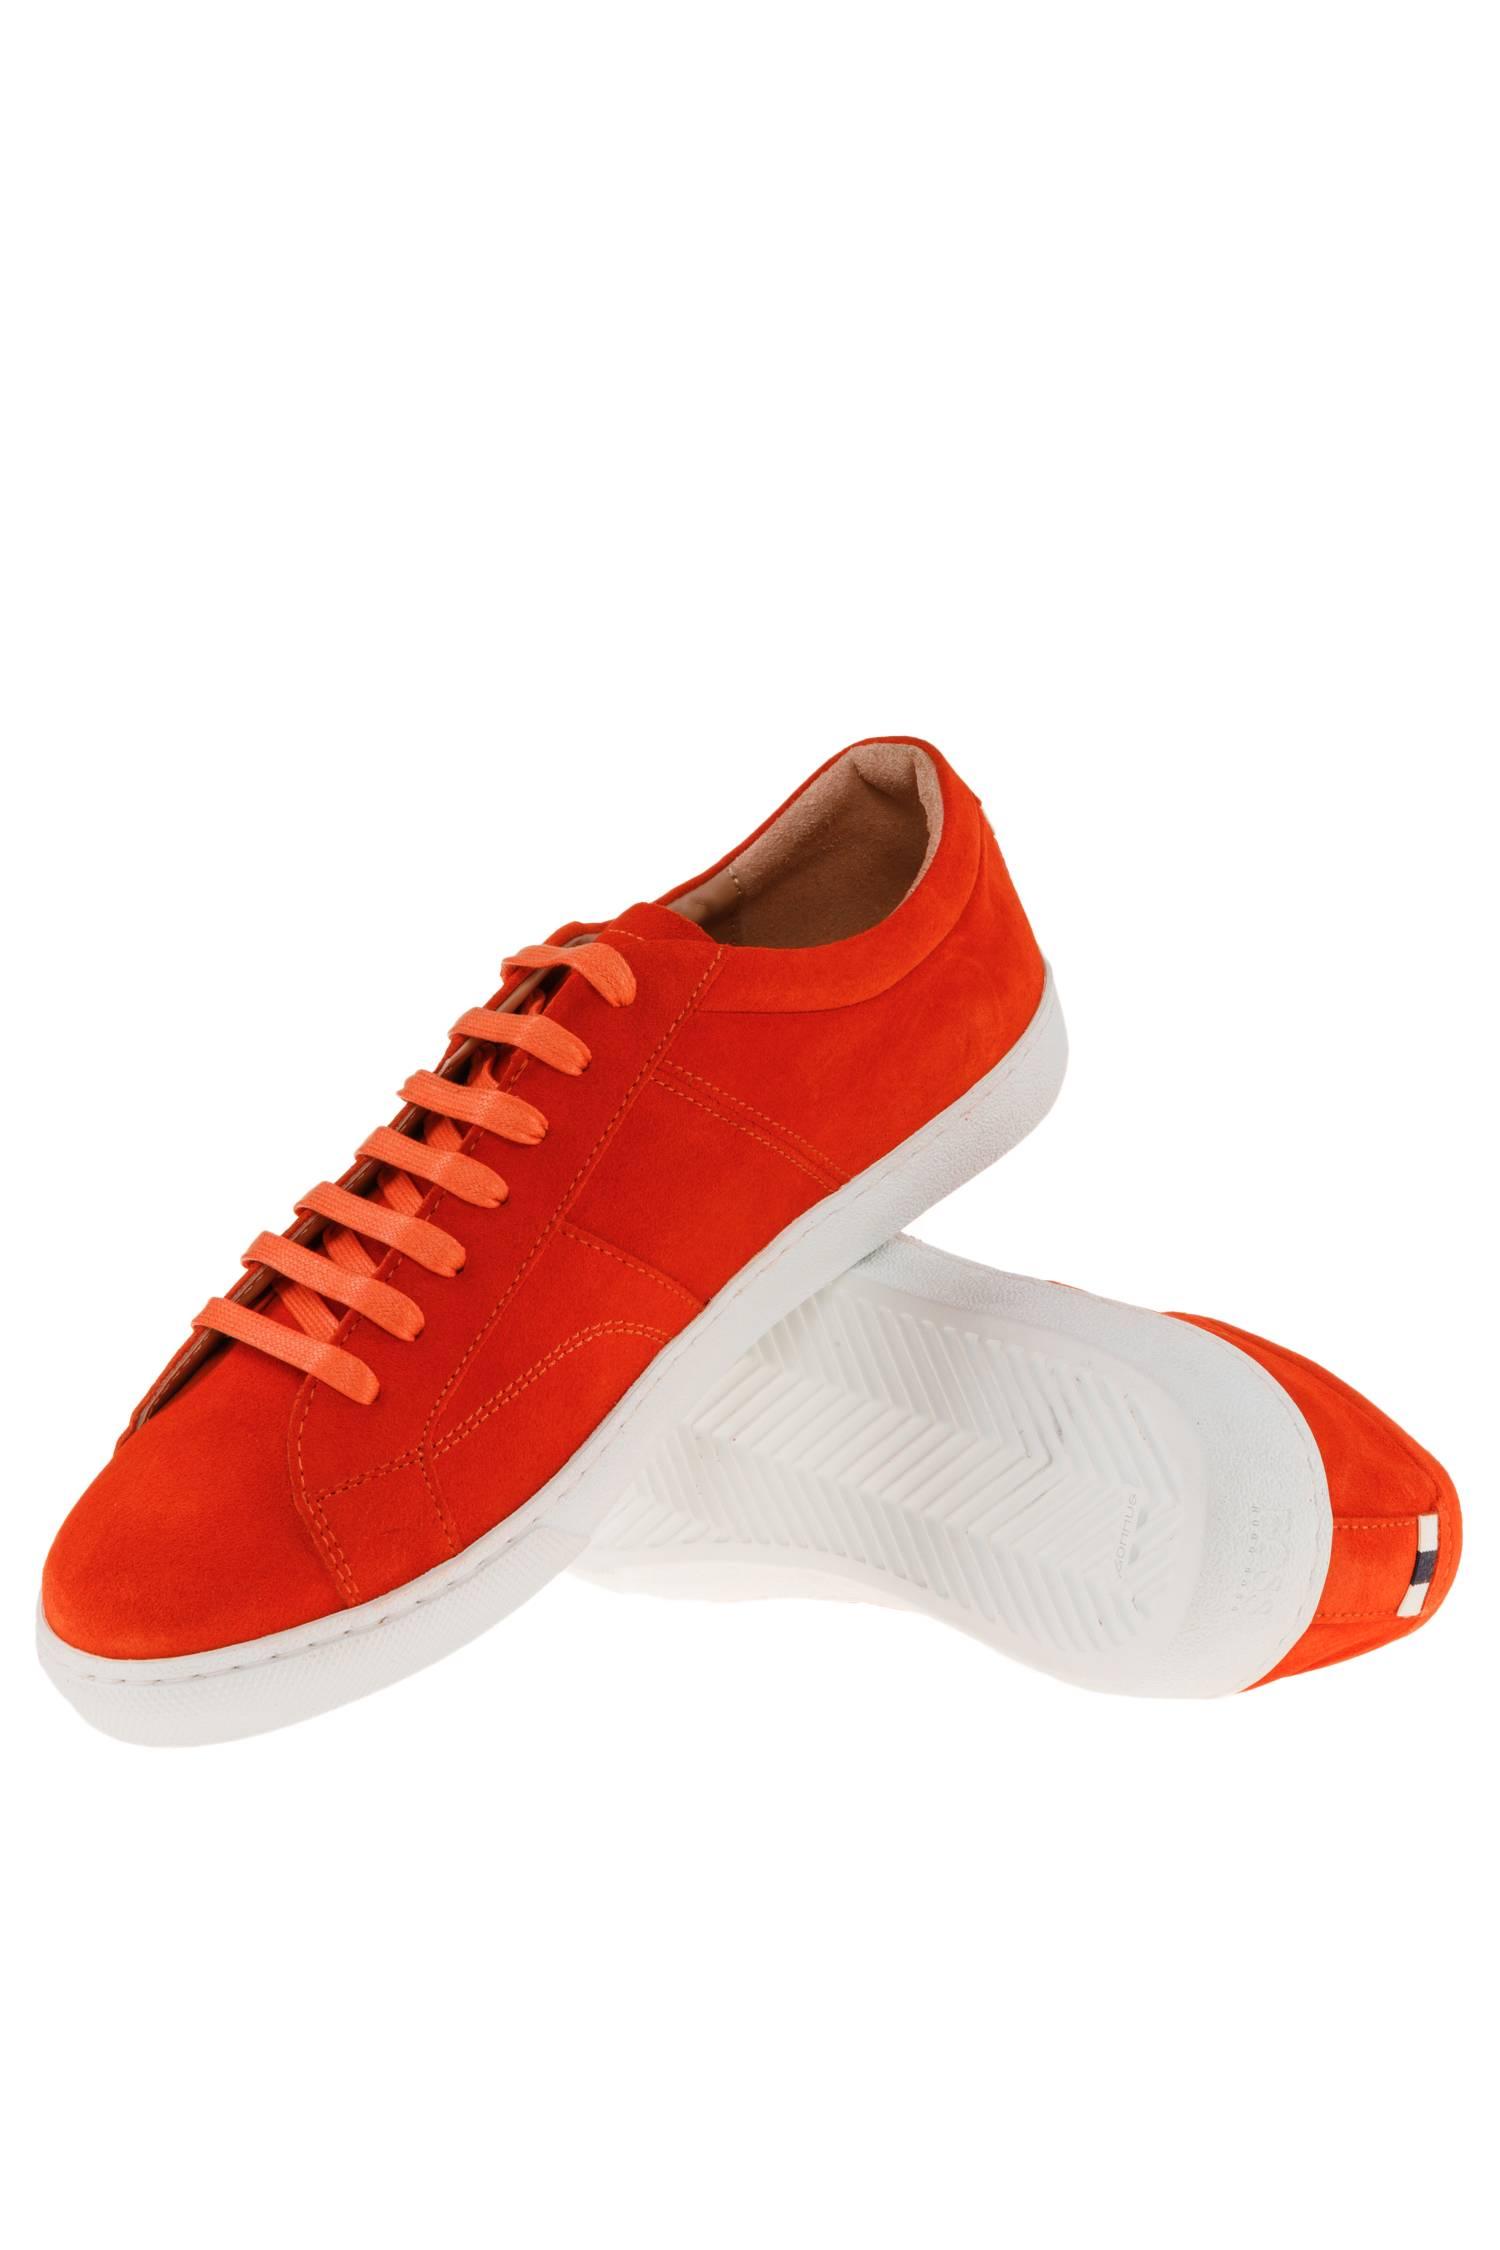 Boss cortos olga low cut-SP, naranja (811) (811) naranja 38 d8c9f5